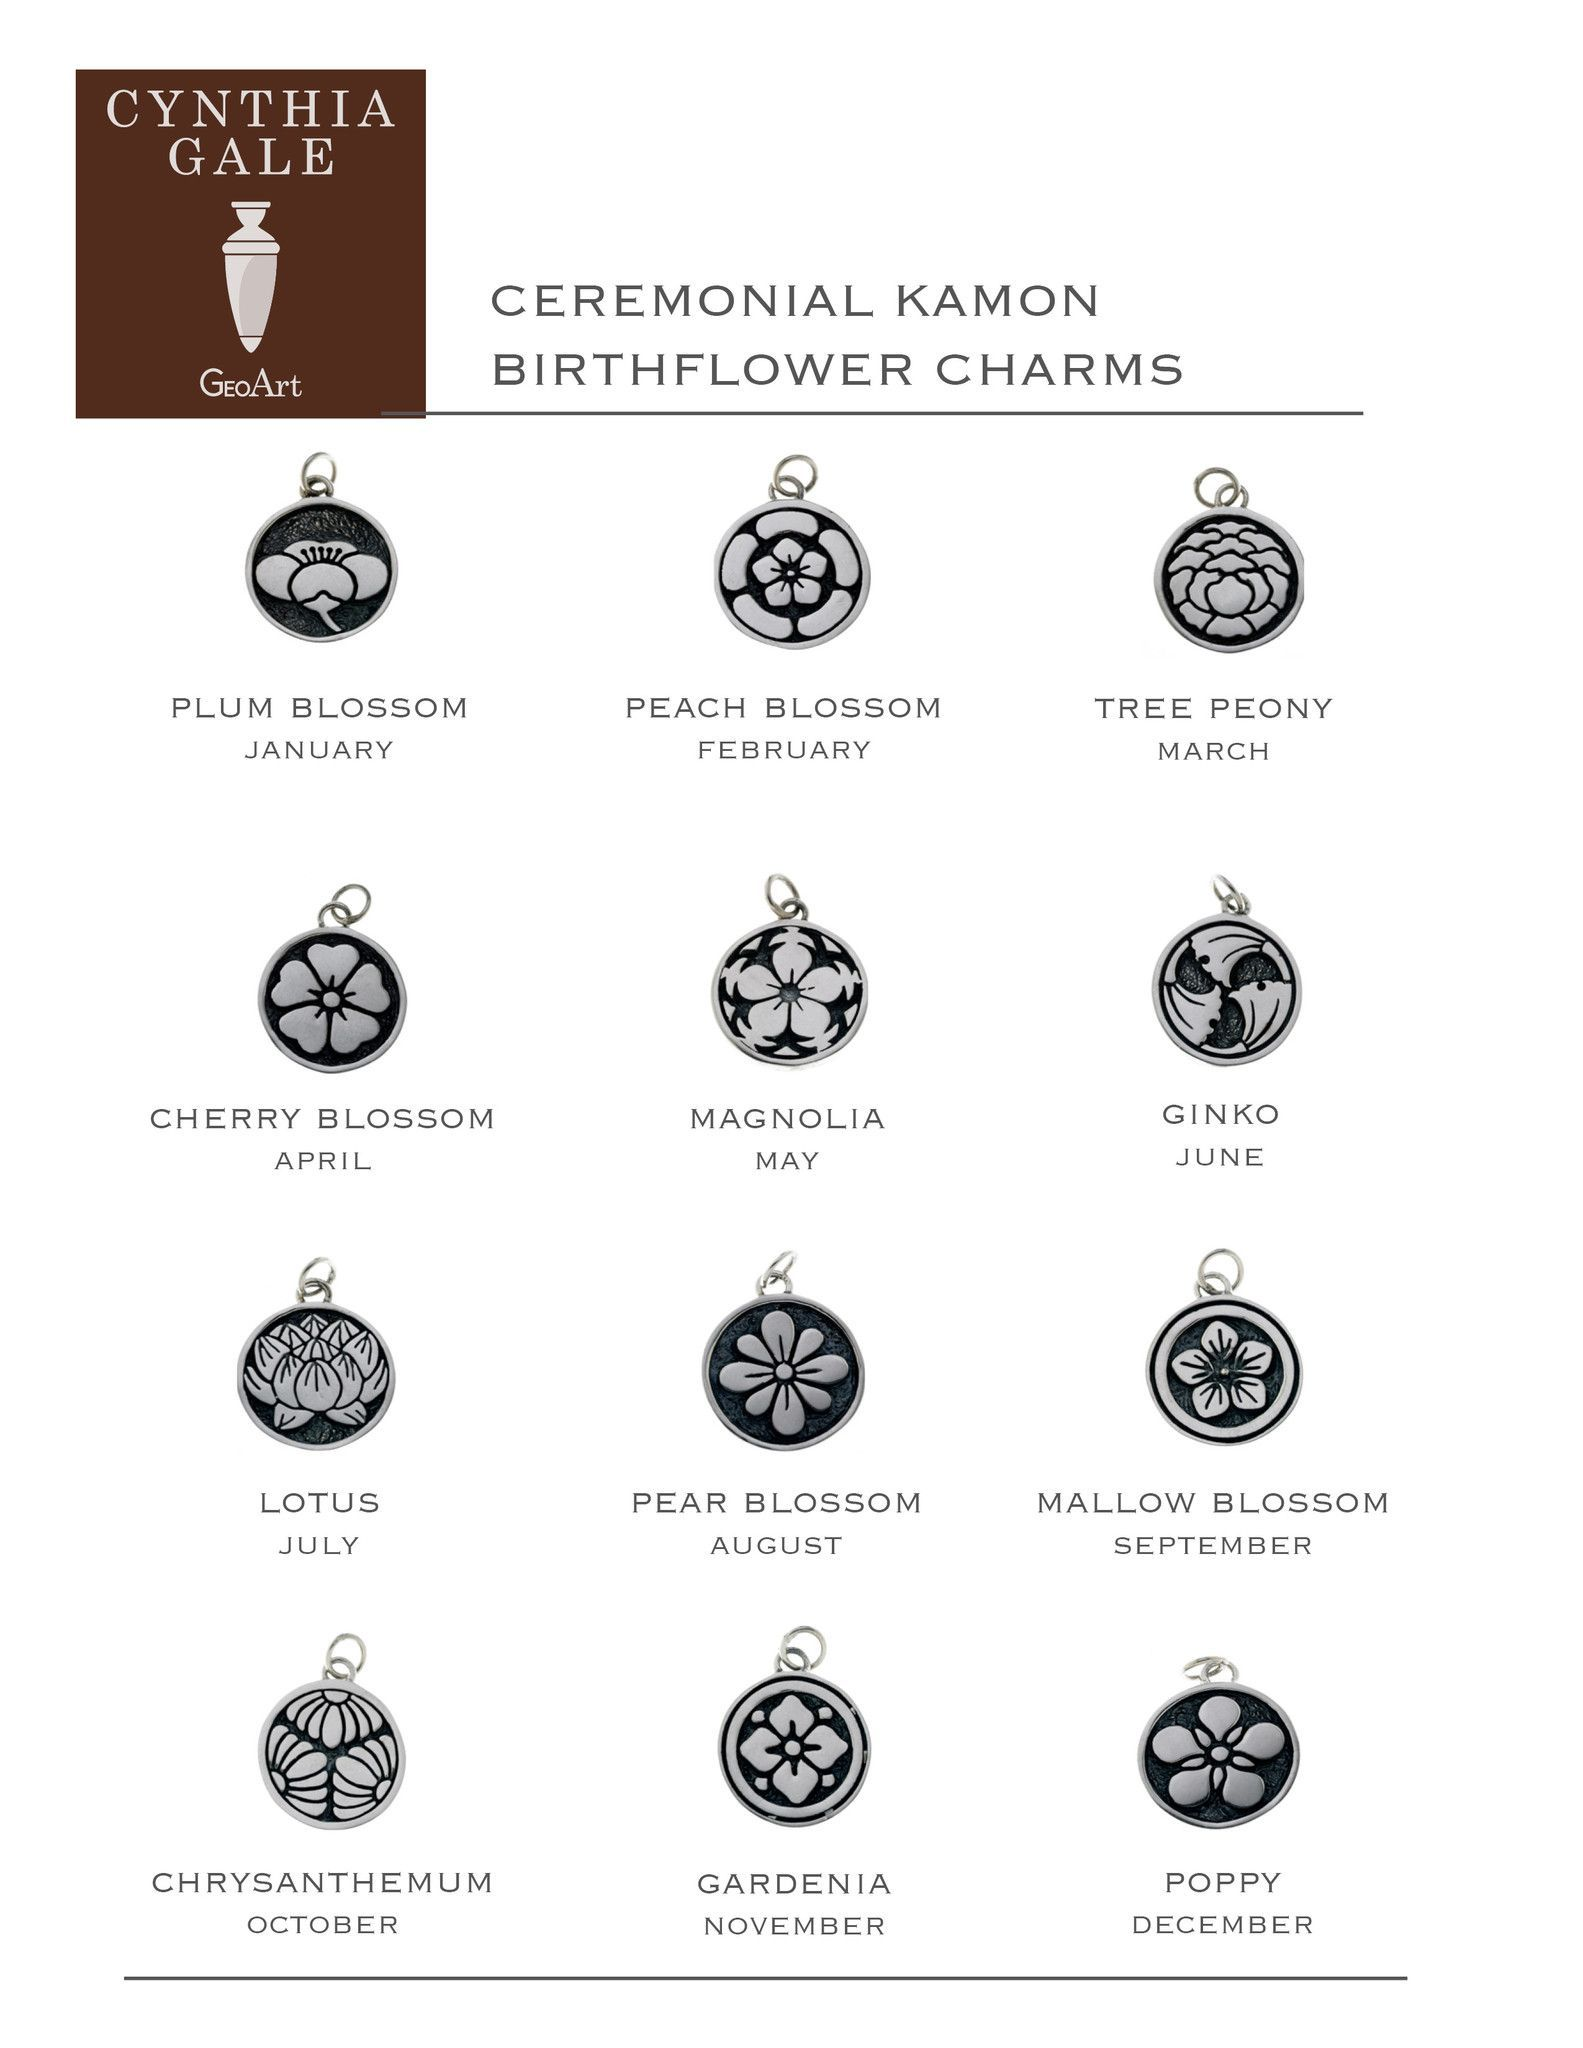 Body piercing map  Ceremonial Kamon Sterling Silver December Poppy Charm  Tattoos